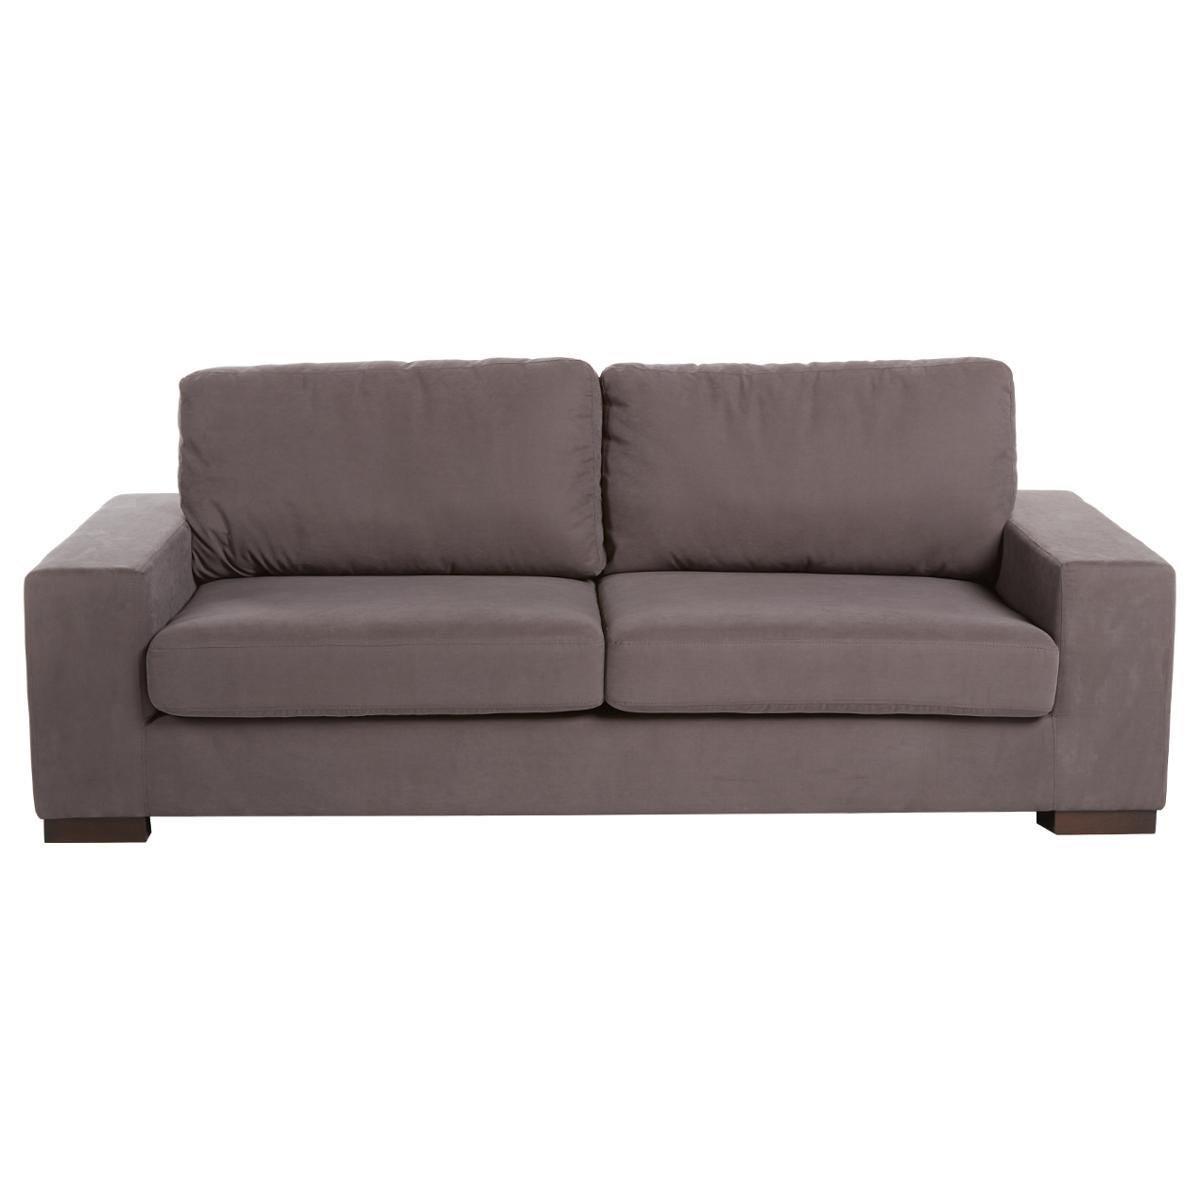 Sofa Italienisches Design sofa italienisches design 3 sitzer stoff taupe city l 203 cm jetzt